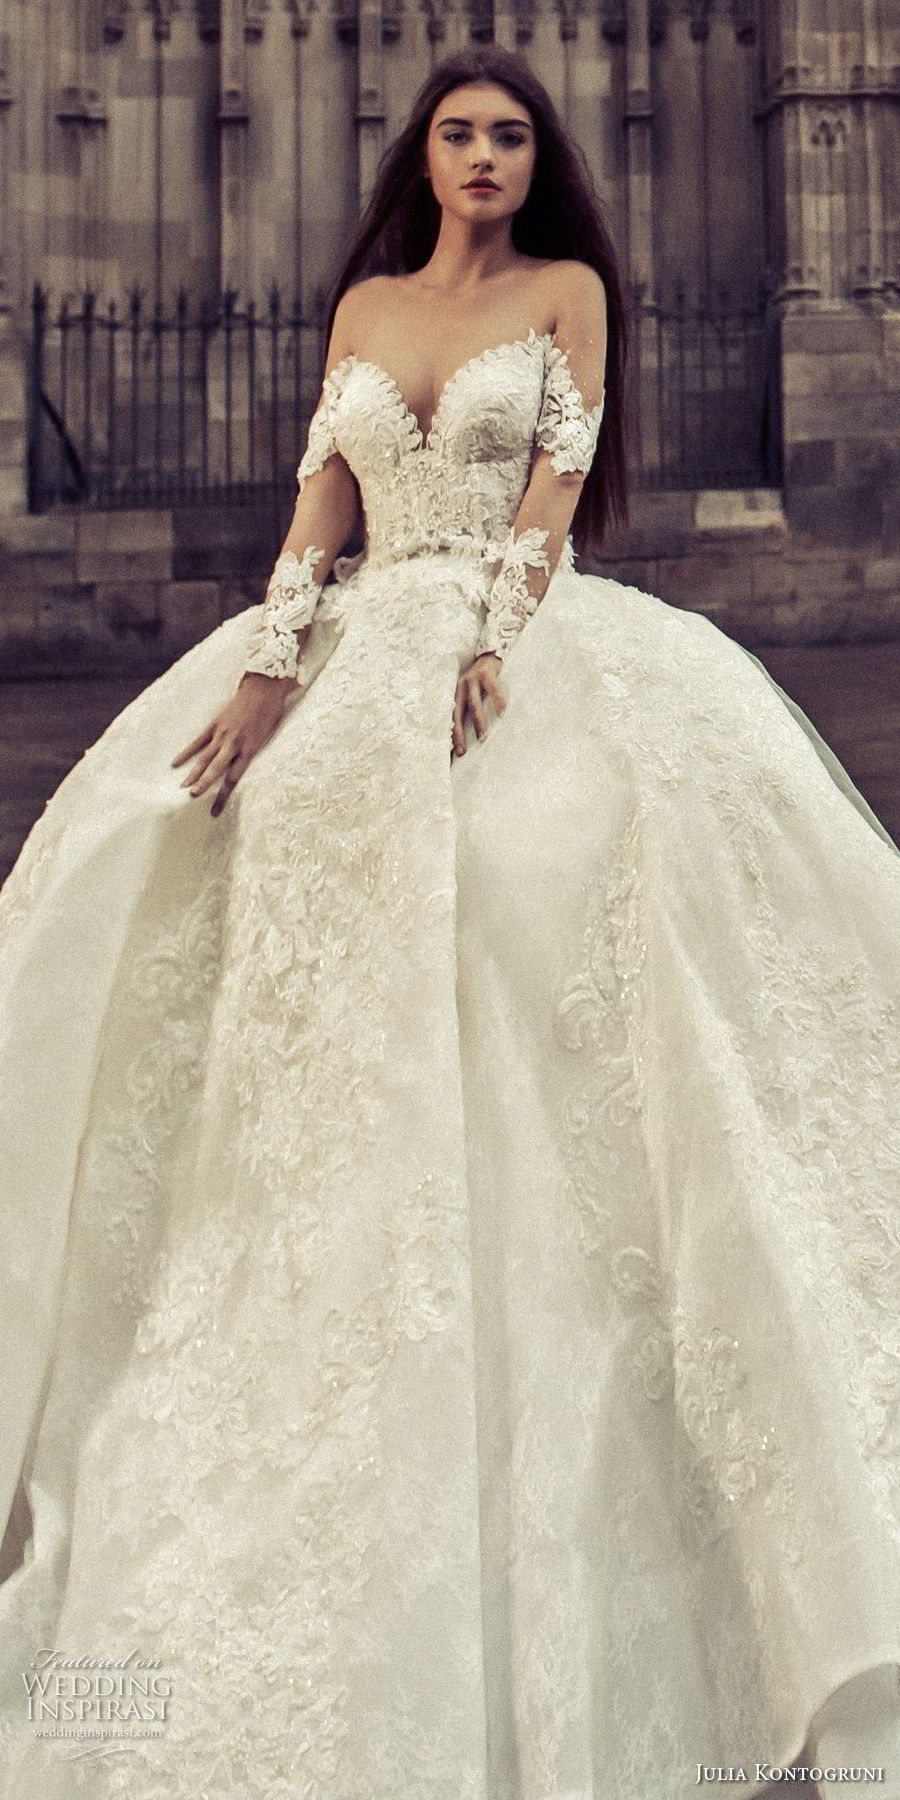 Corona Borealis 2018 Wedding Dresses Wedding Dresses Ball Gowns